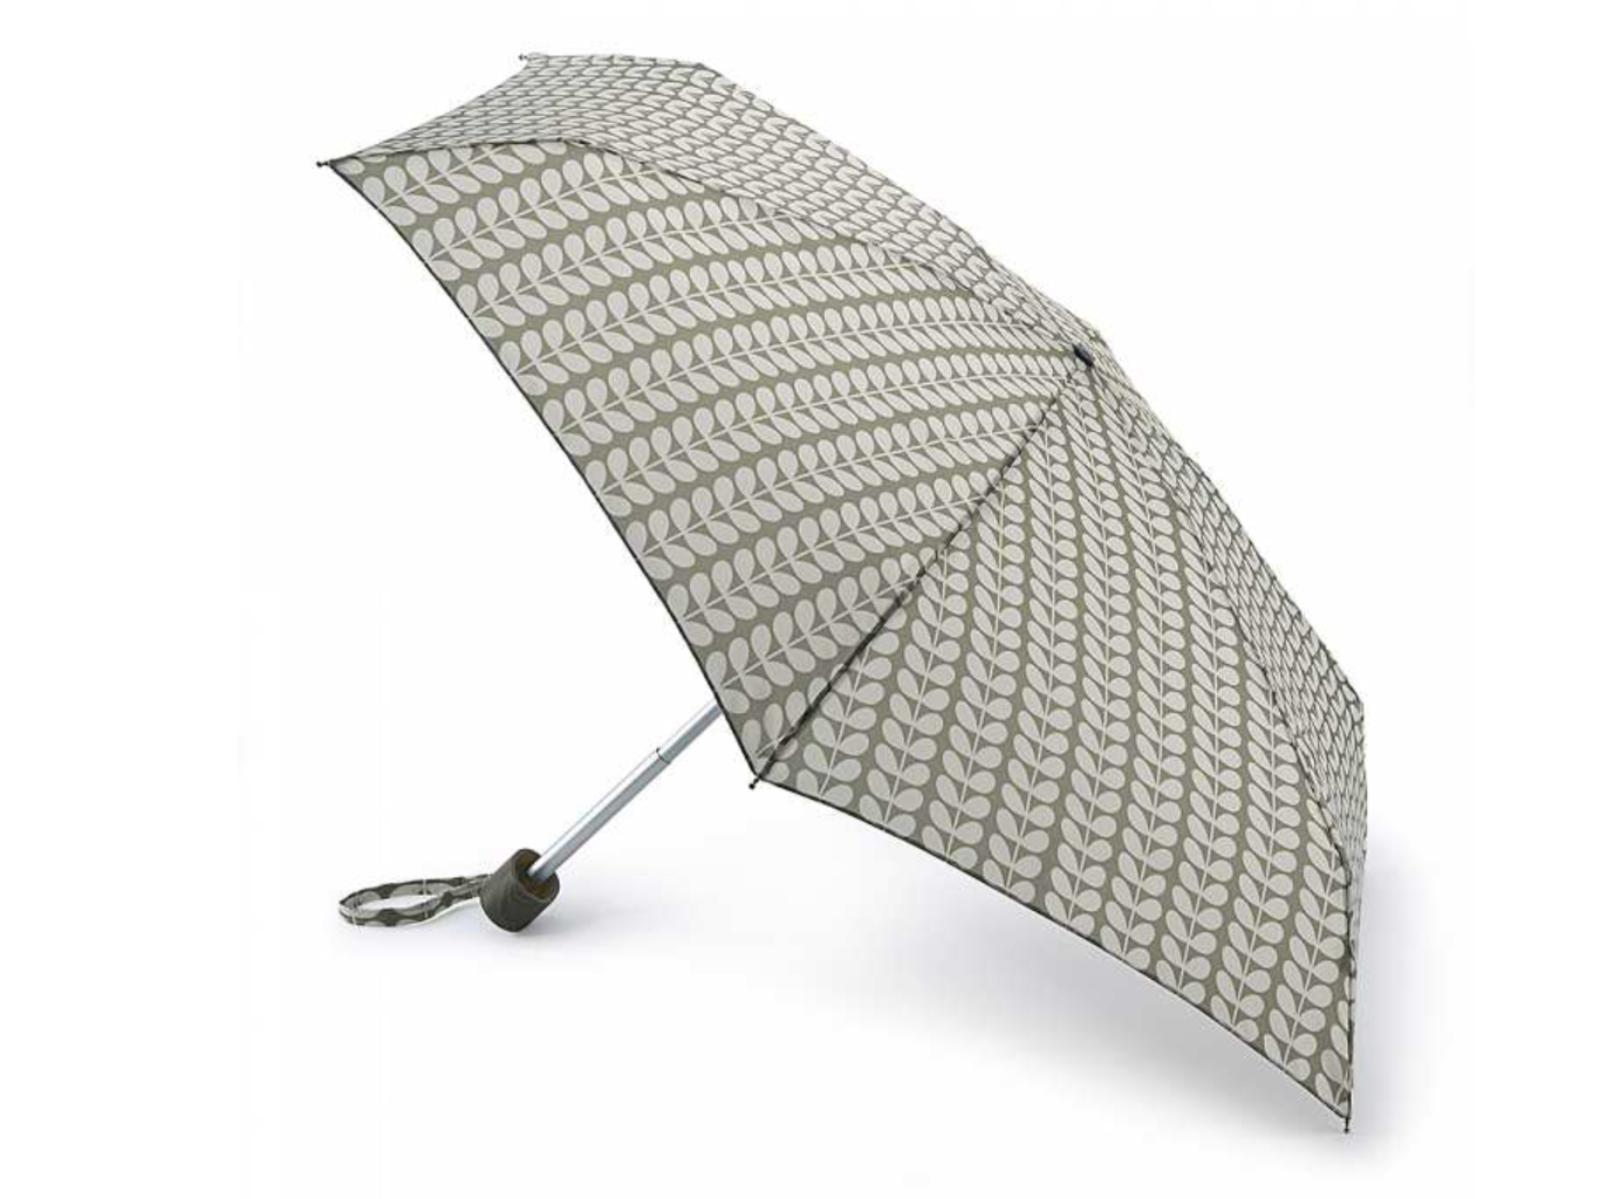 Fulton Orla Kiely Tiny Stem compact Umbrella handbag Beige Cream RRP